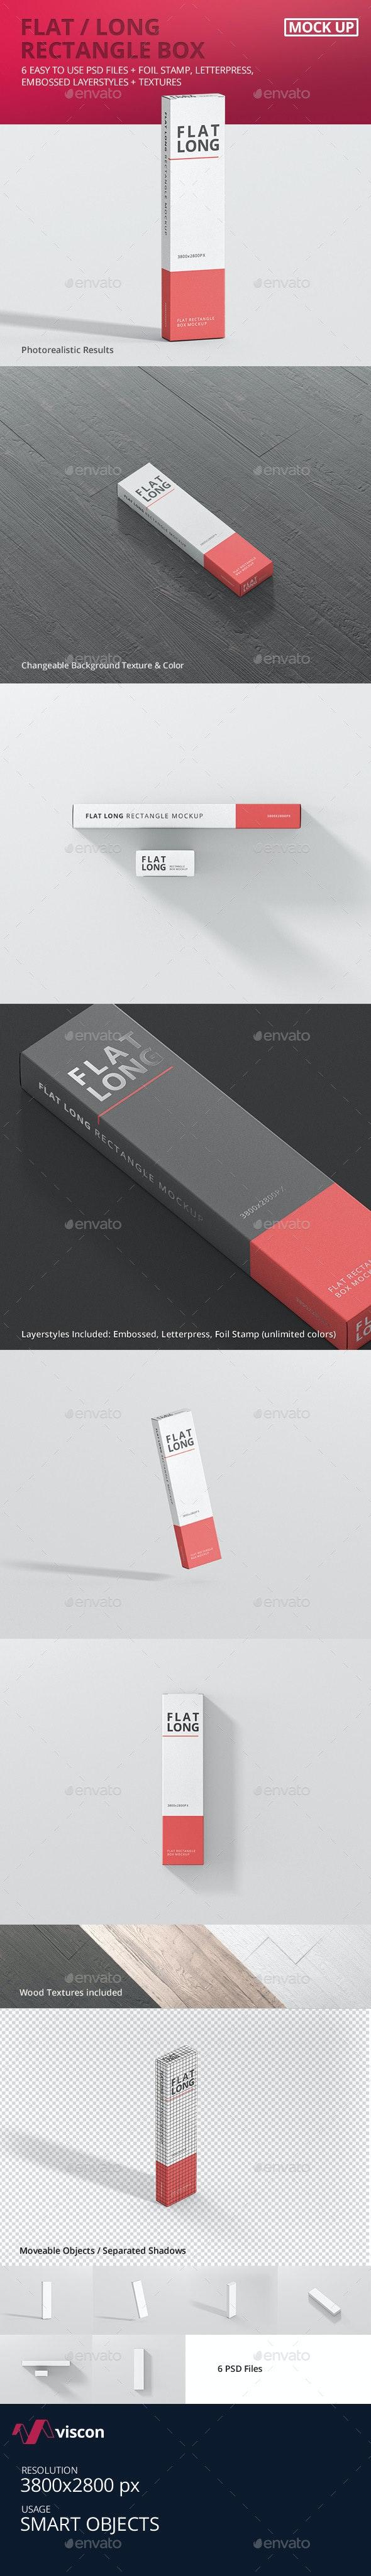 Box Mockup - Flat Long Rectangle - Miscellaneous Packaging